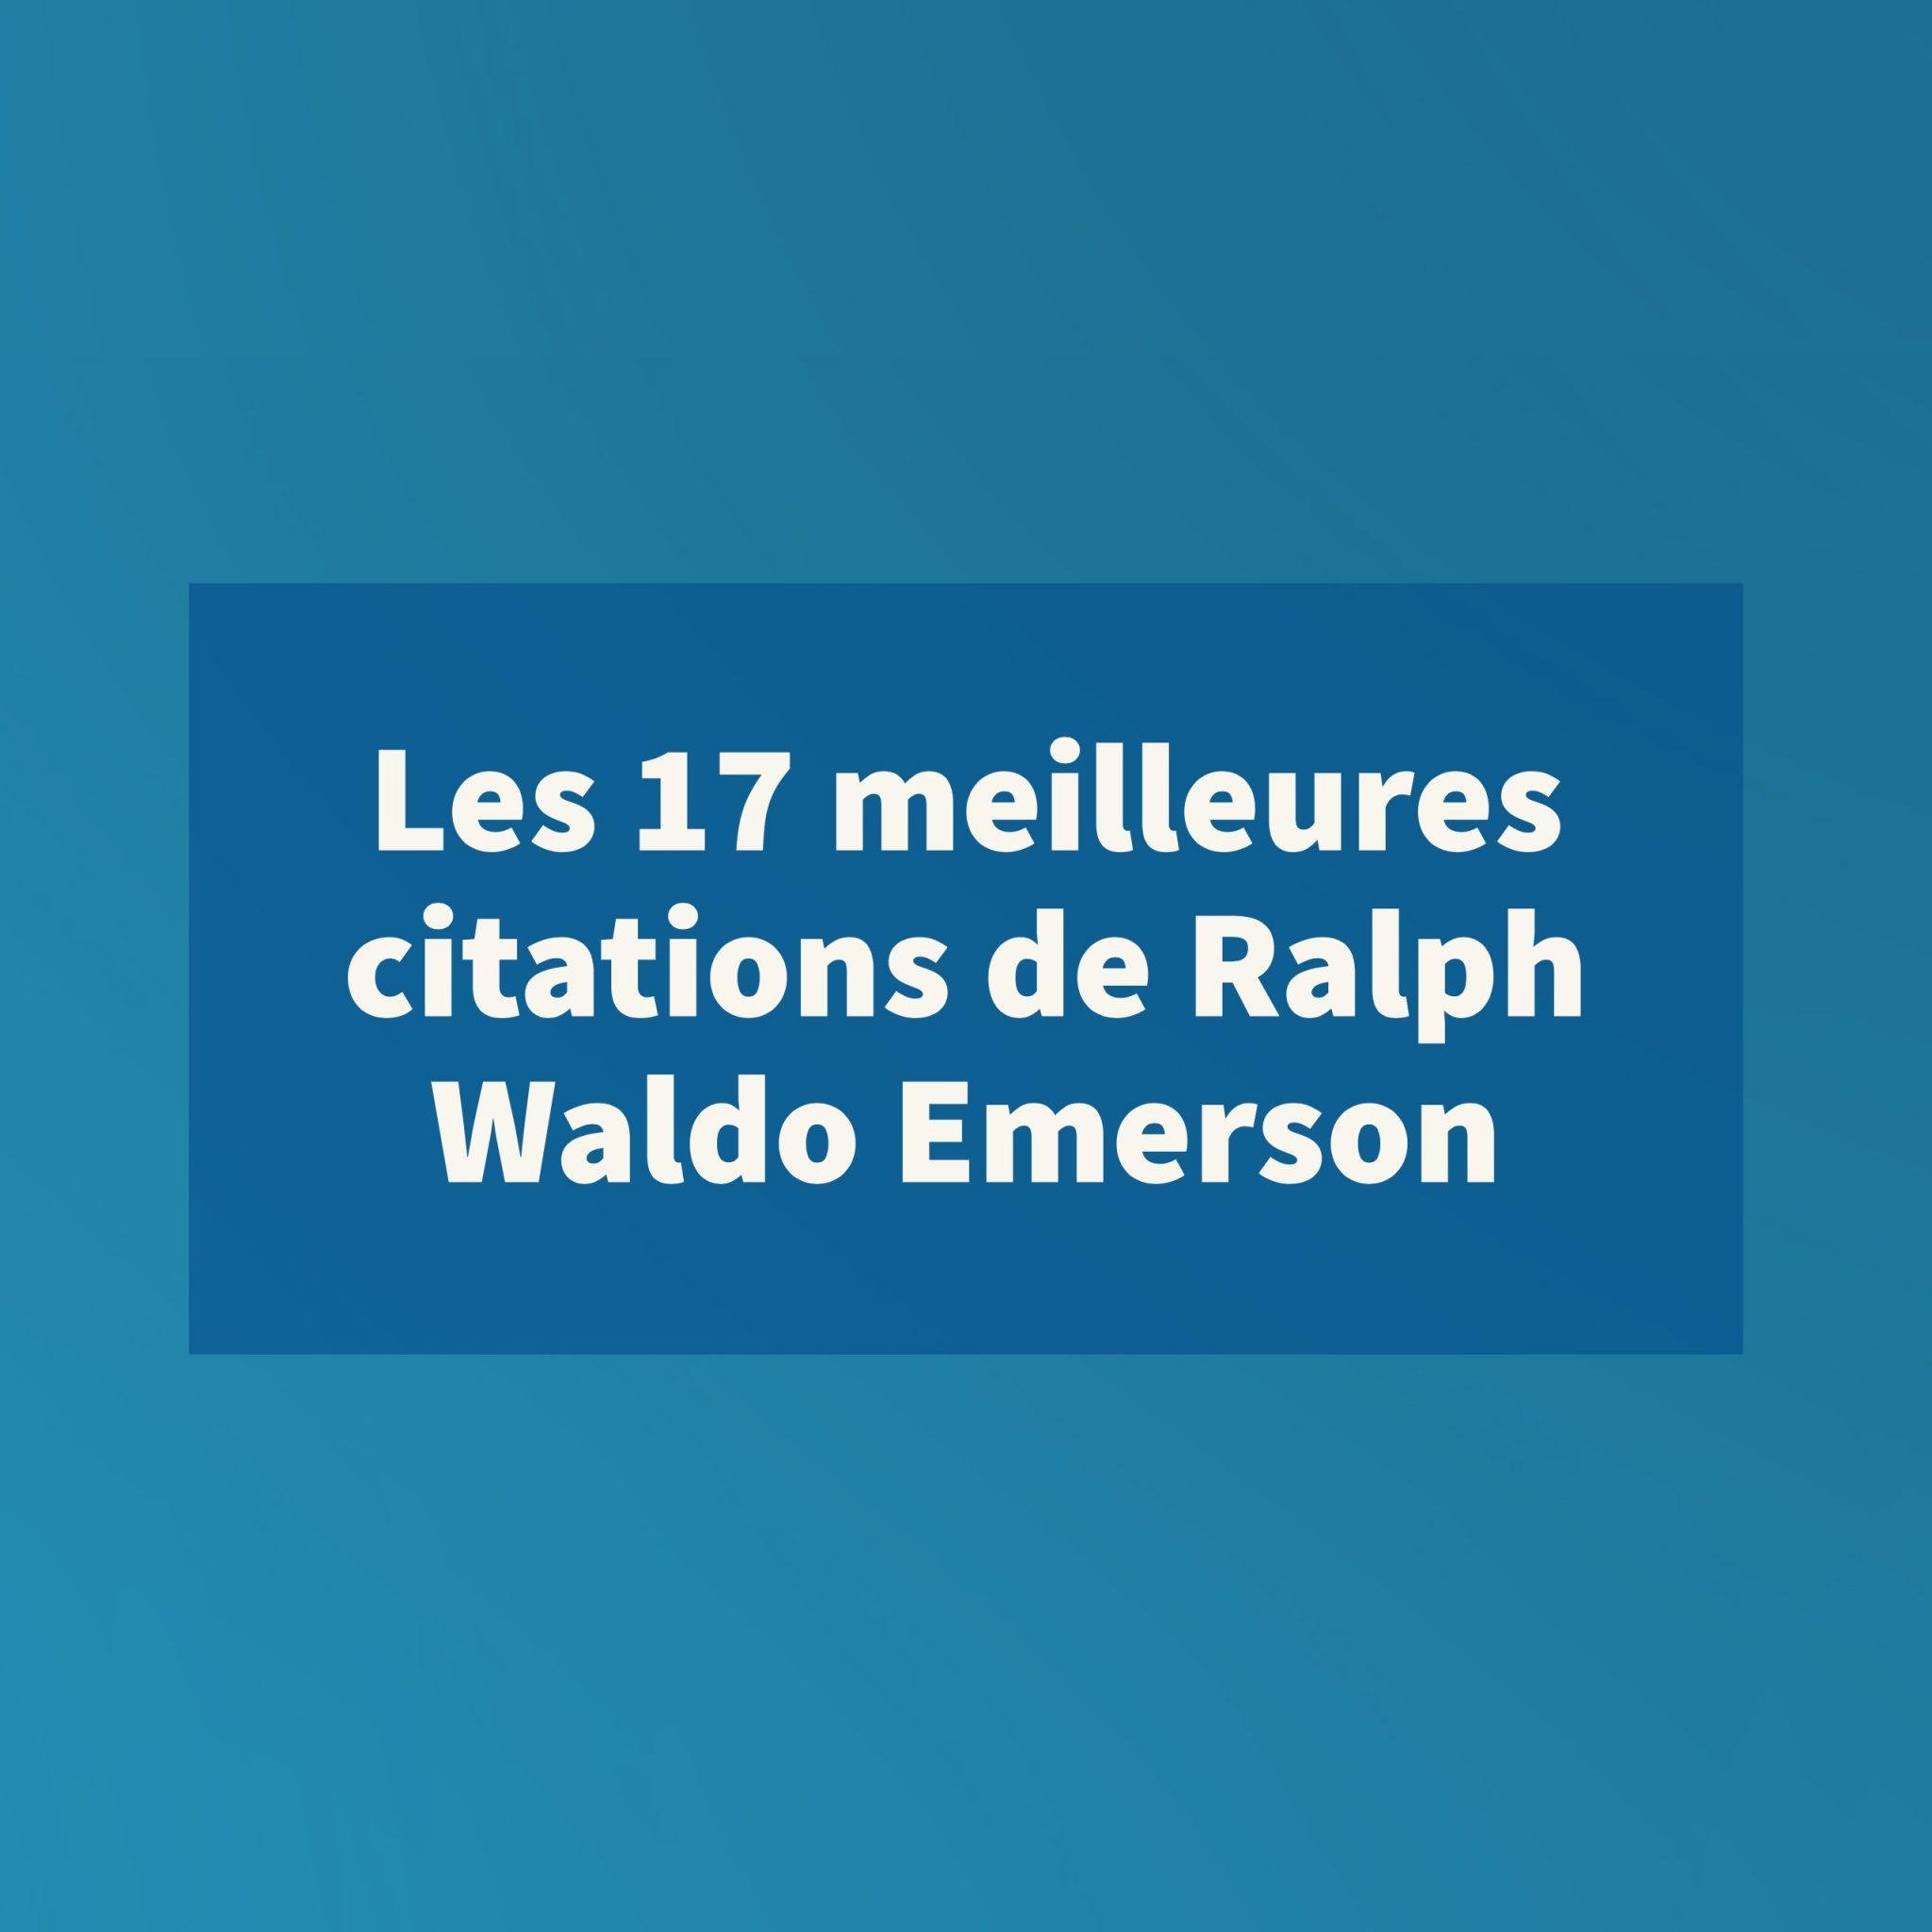 Les 17 meilleures citations de Ralph Waldo Emerson